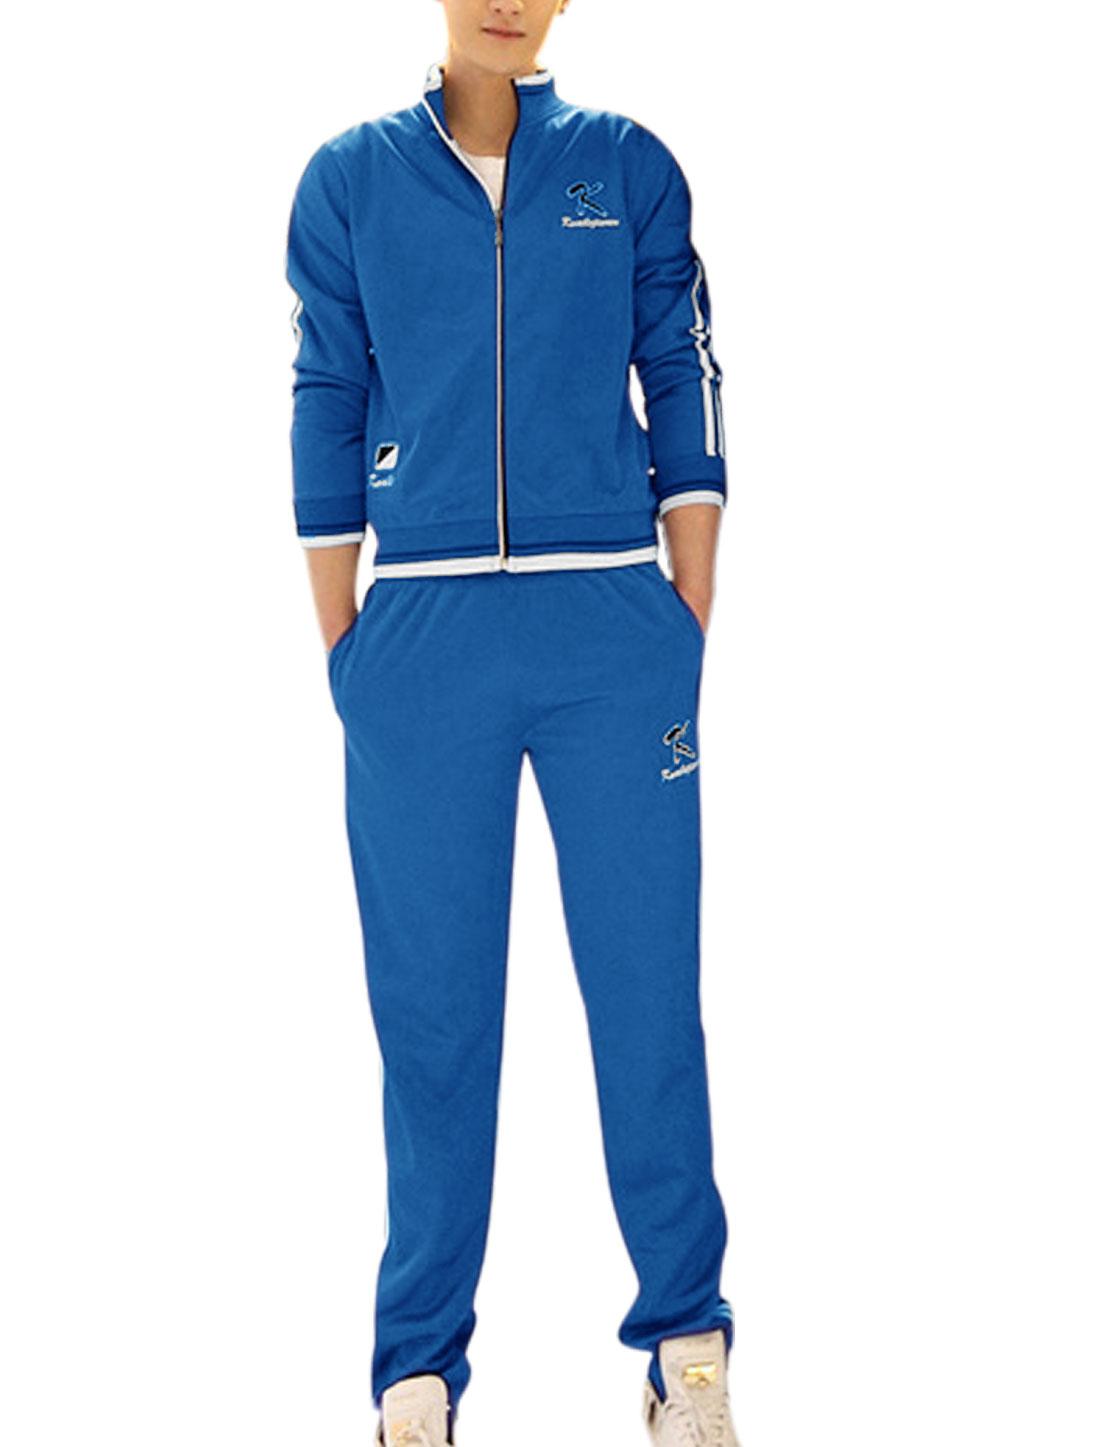 Man's Long Sleeve Zip Up Jacket w Elastic Waist Side Pockets Pants Royal Blue S